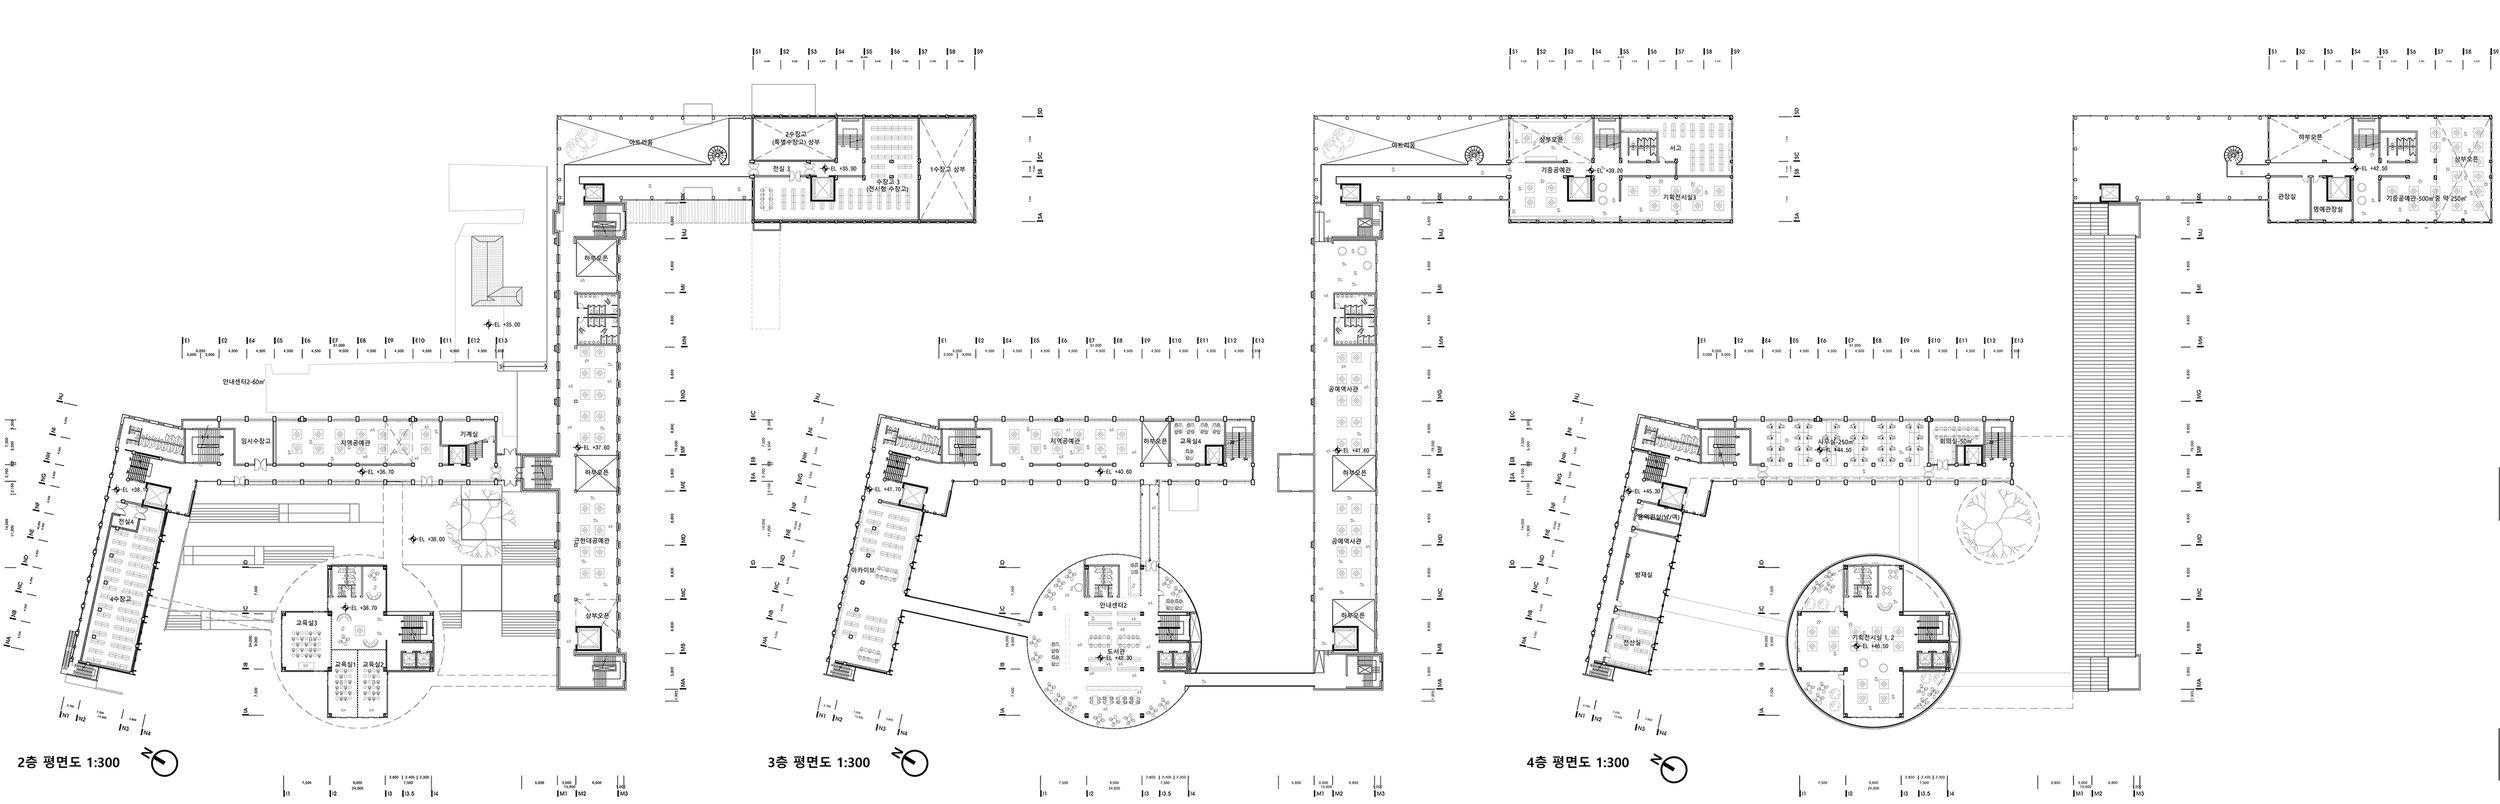 2F-4F FLOOR PLAN